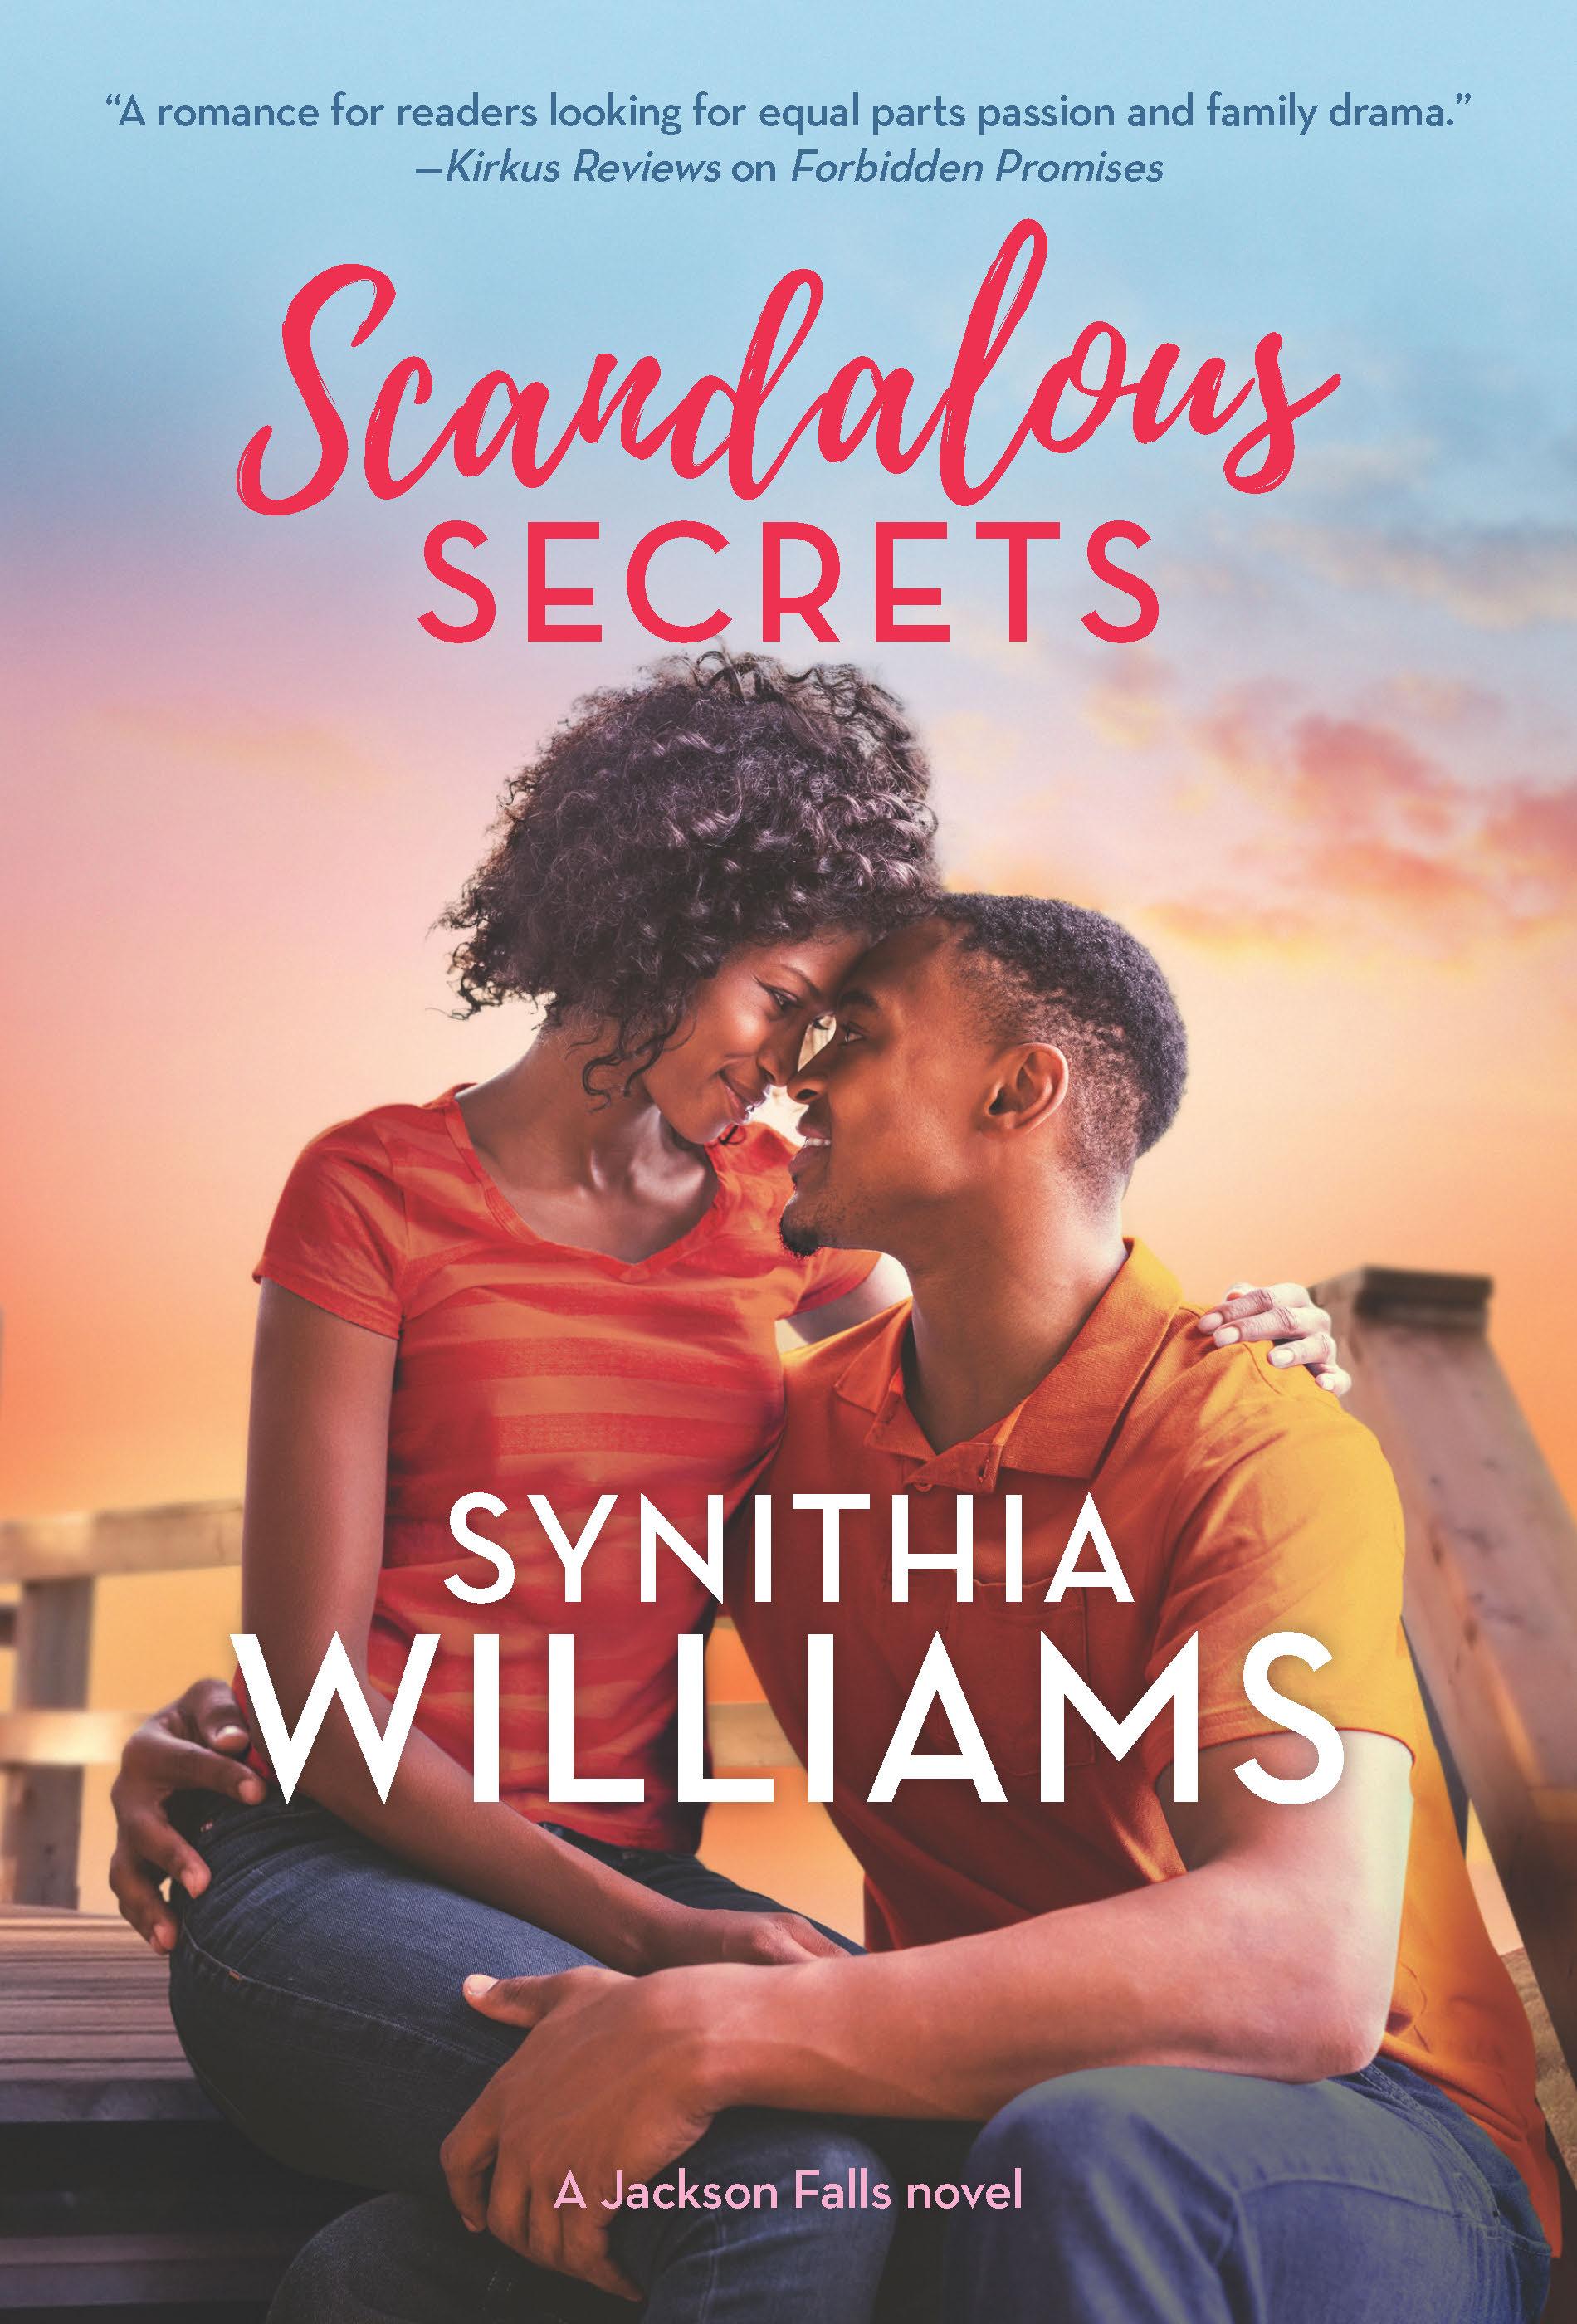 Scandalous Secrets Cover